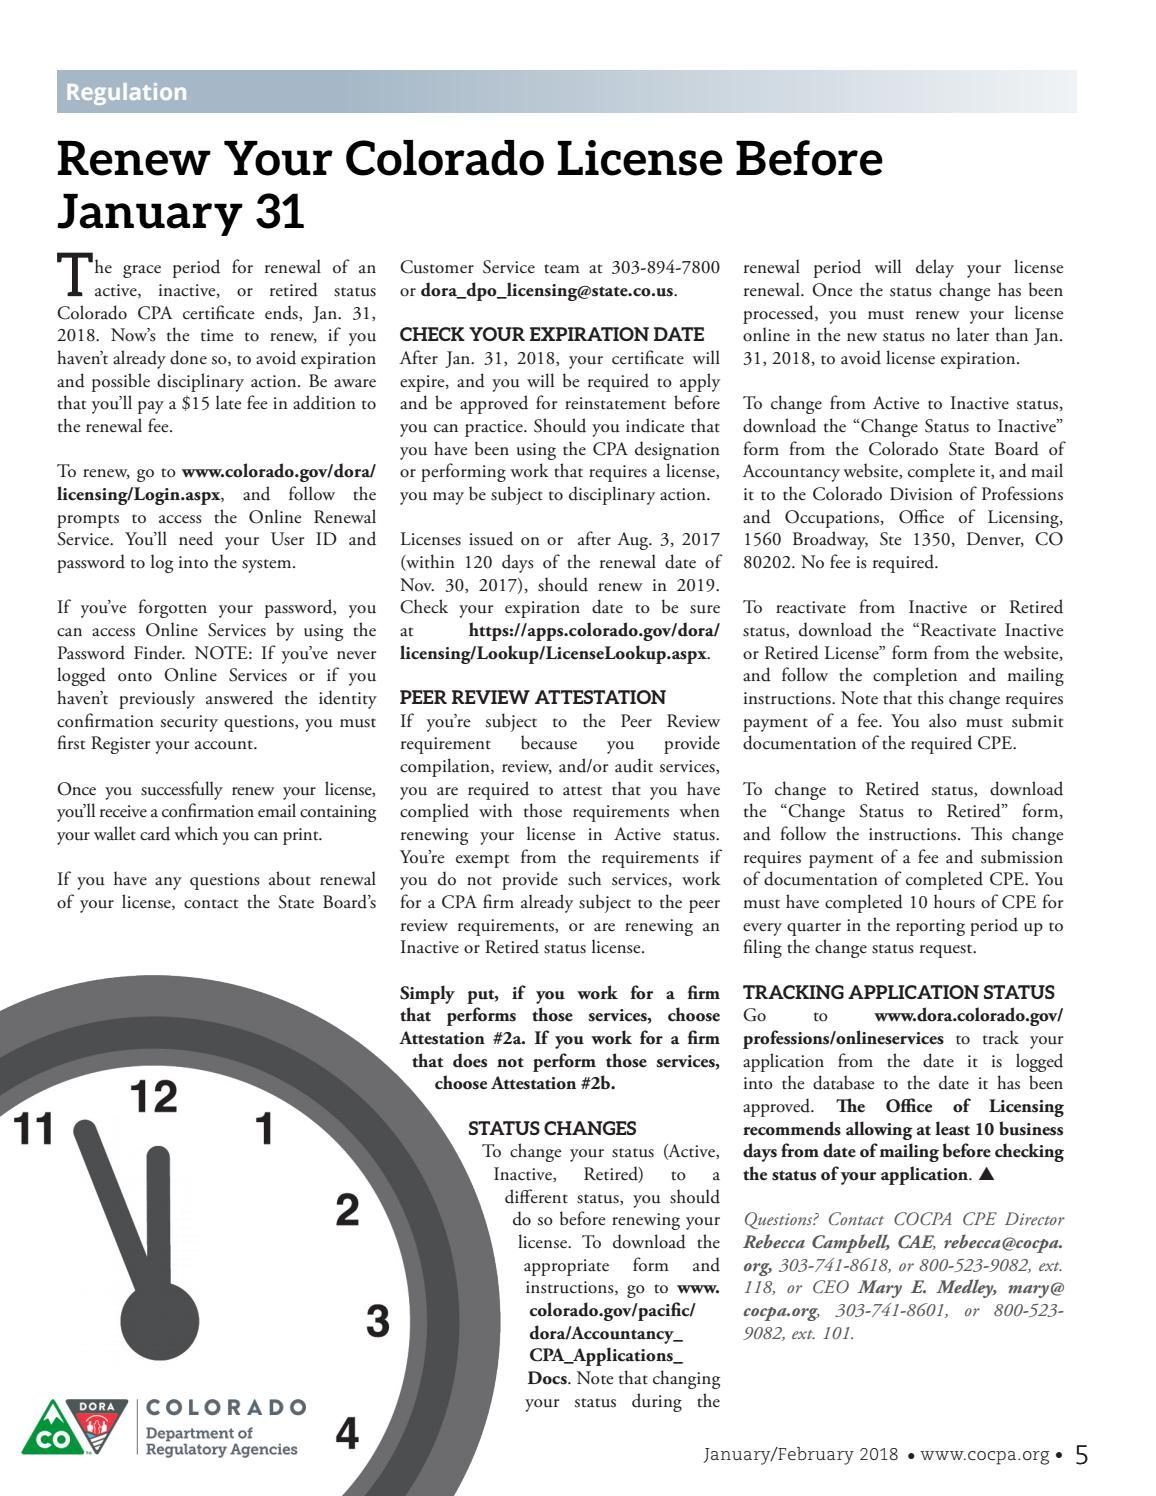 COCPA NewsAccount - January/February 2018 by Colorado